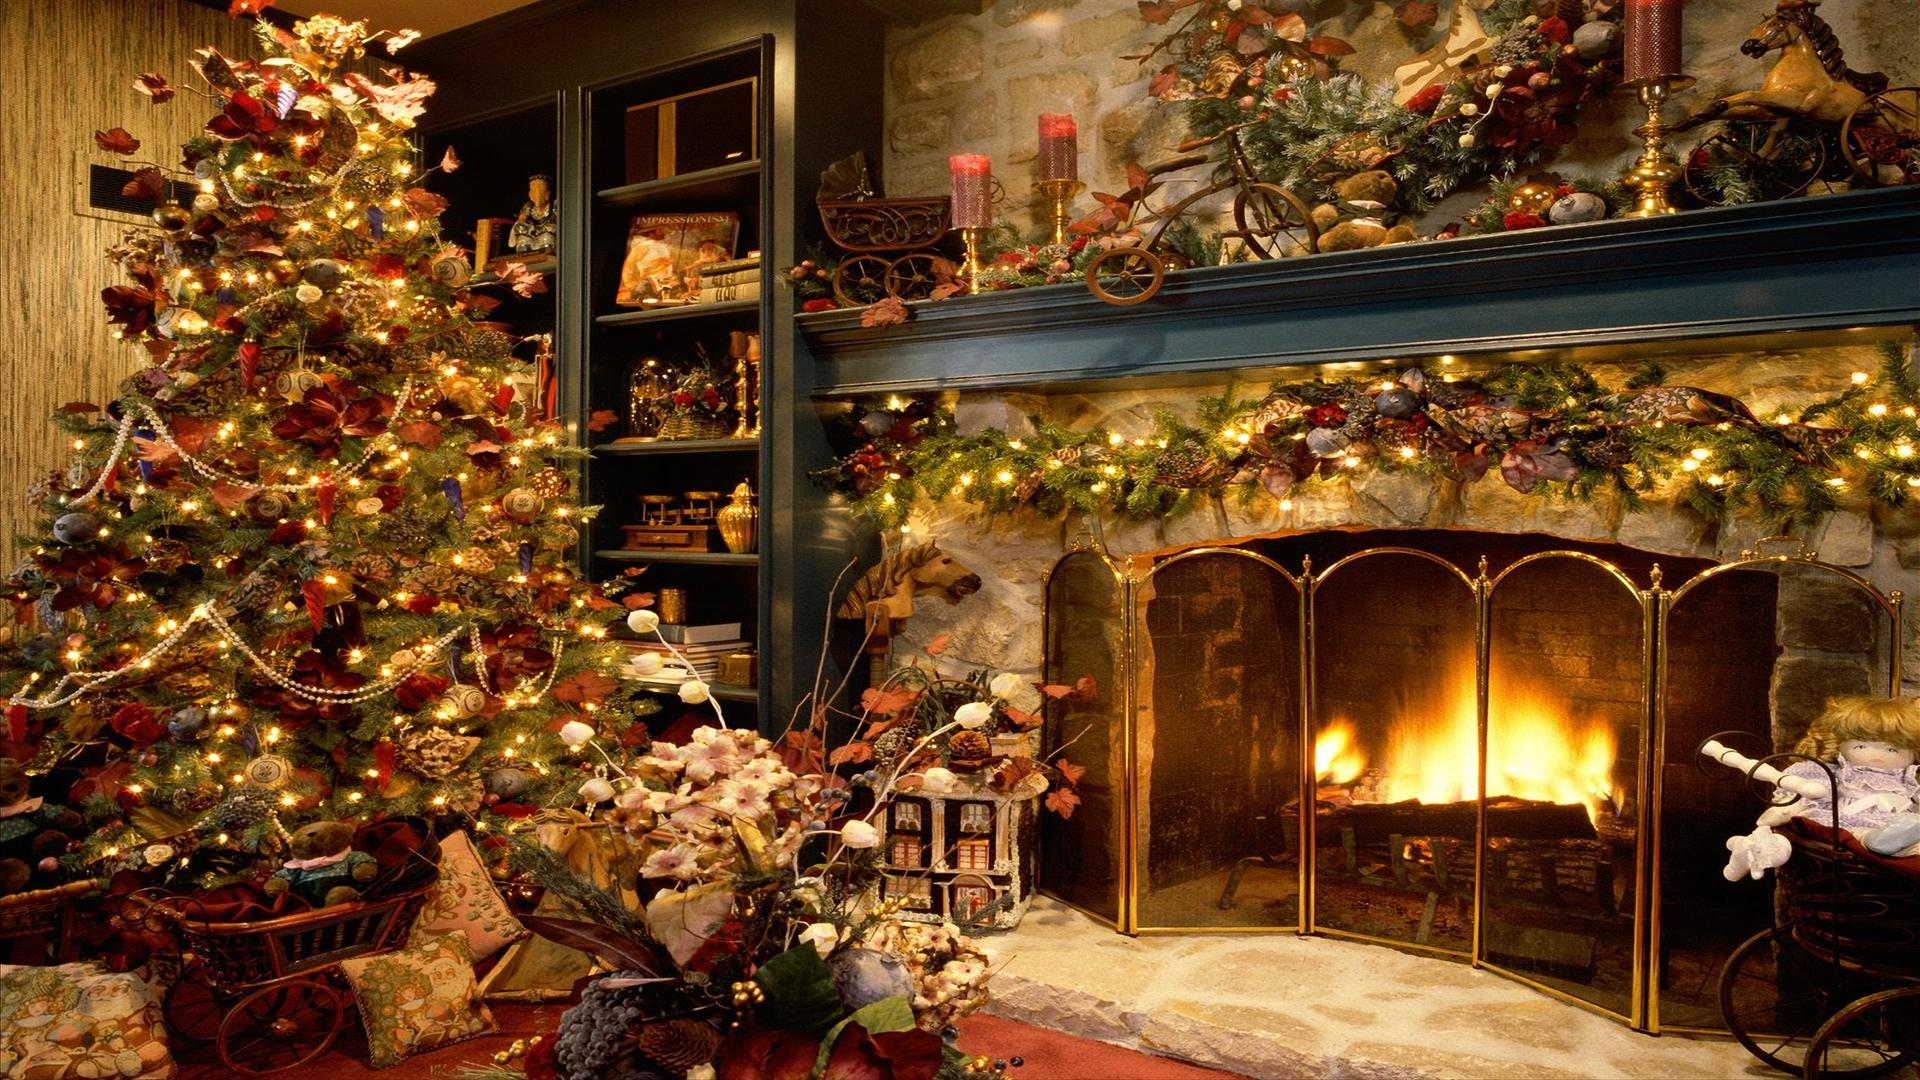 Christmas HD wallpaper | 1920x1080 | #43063